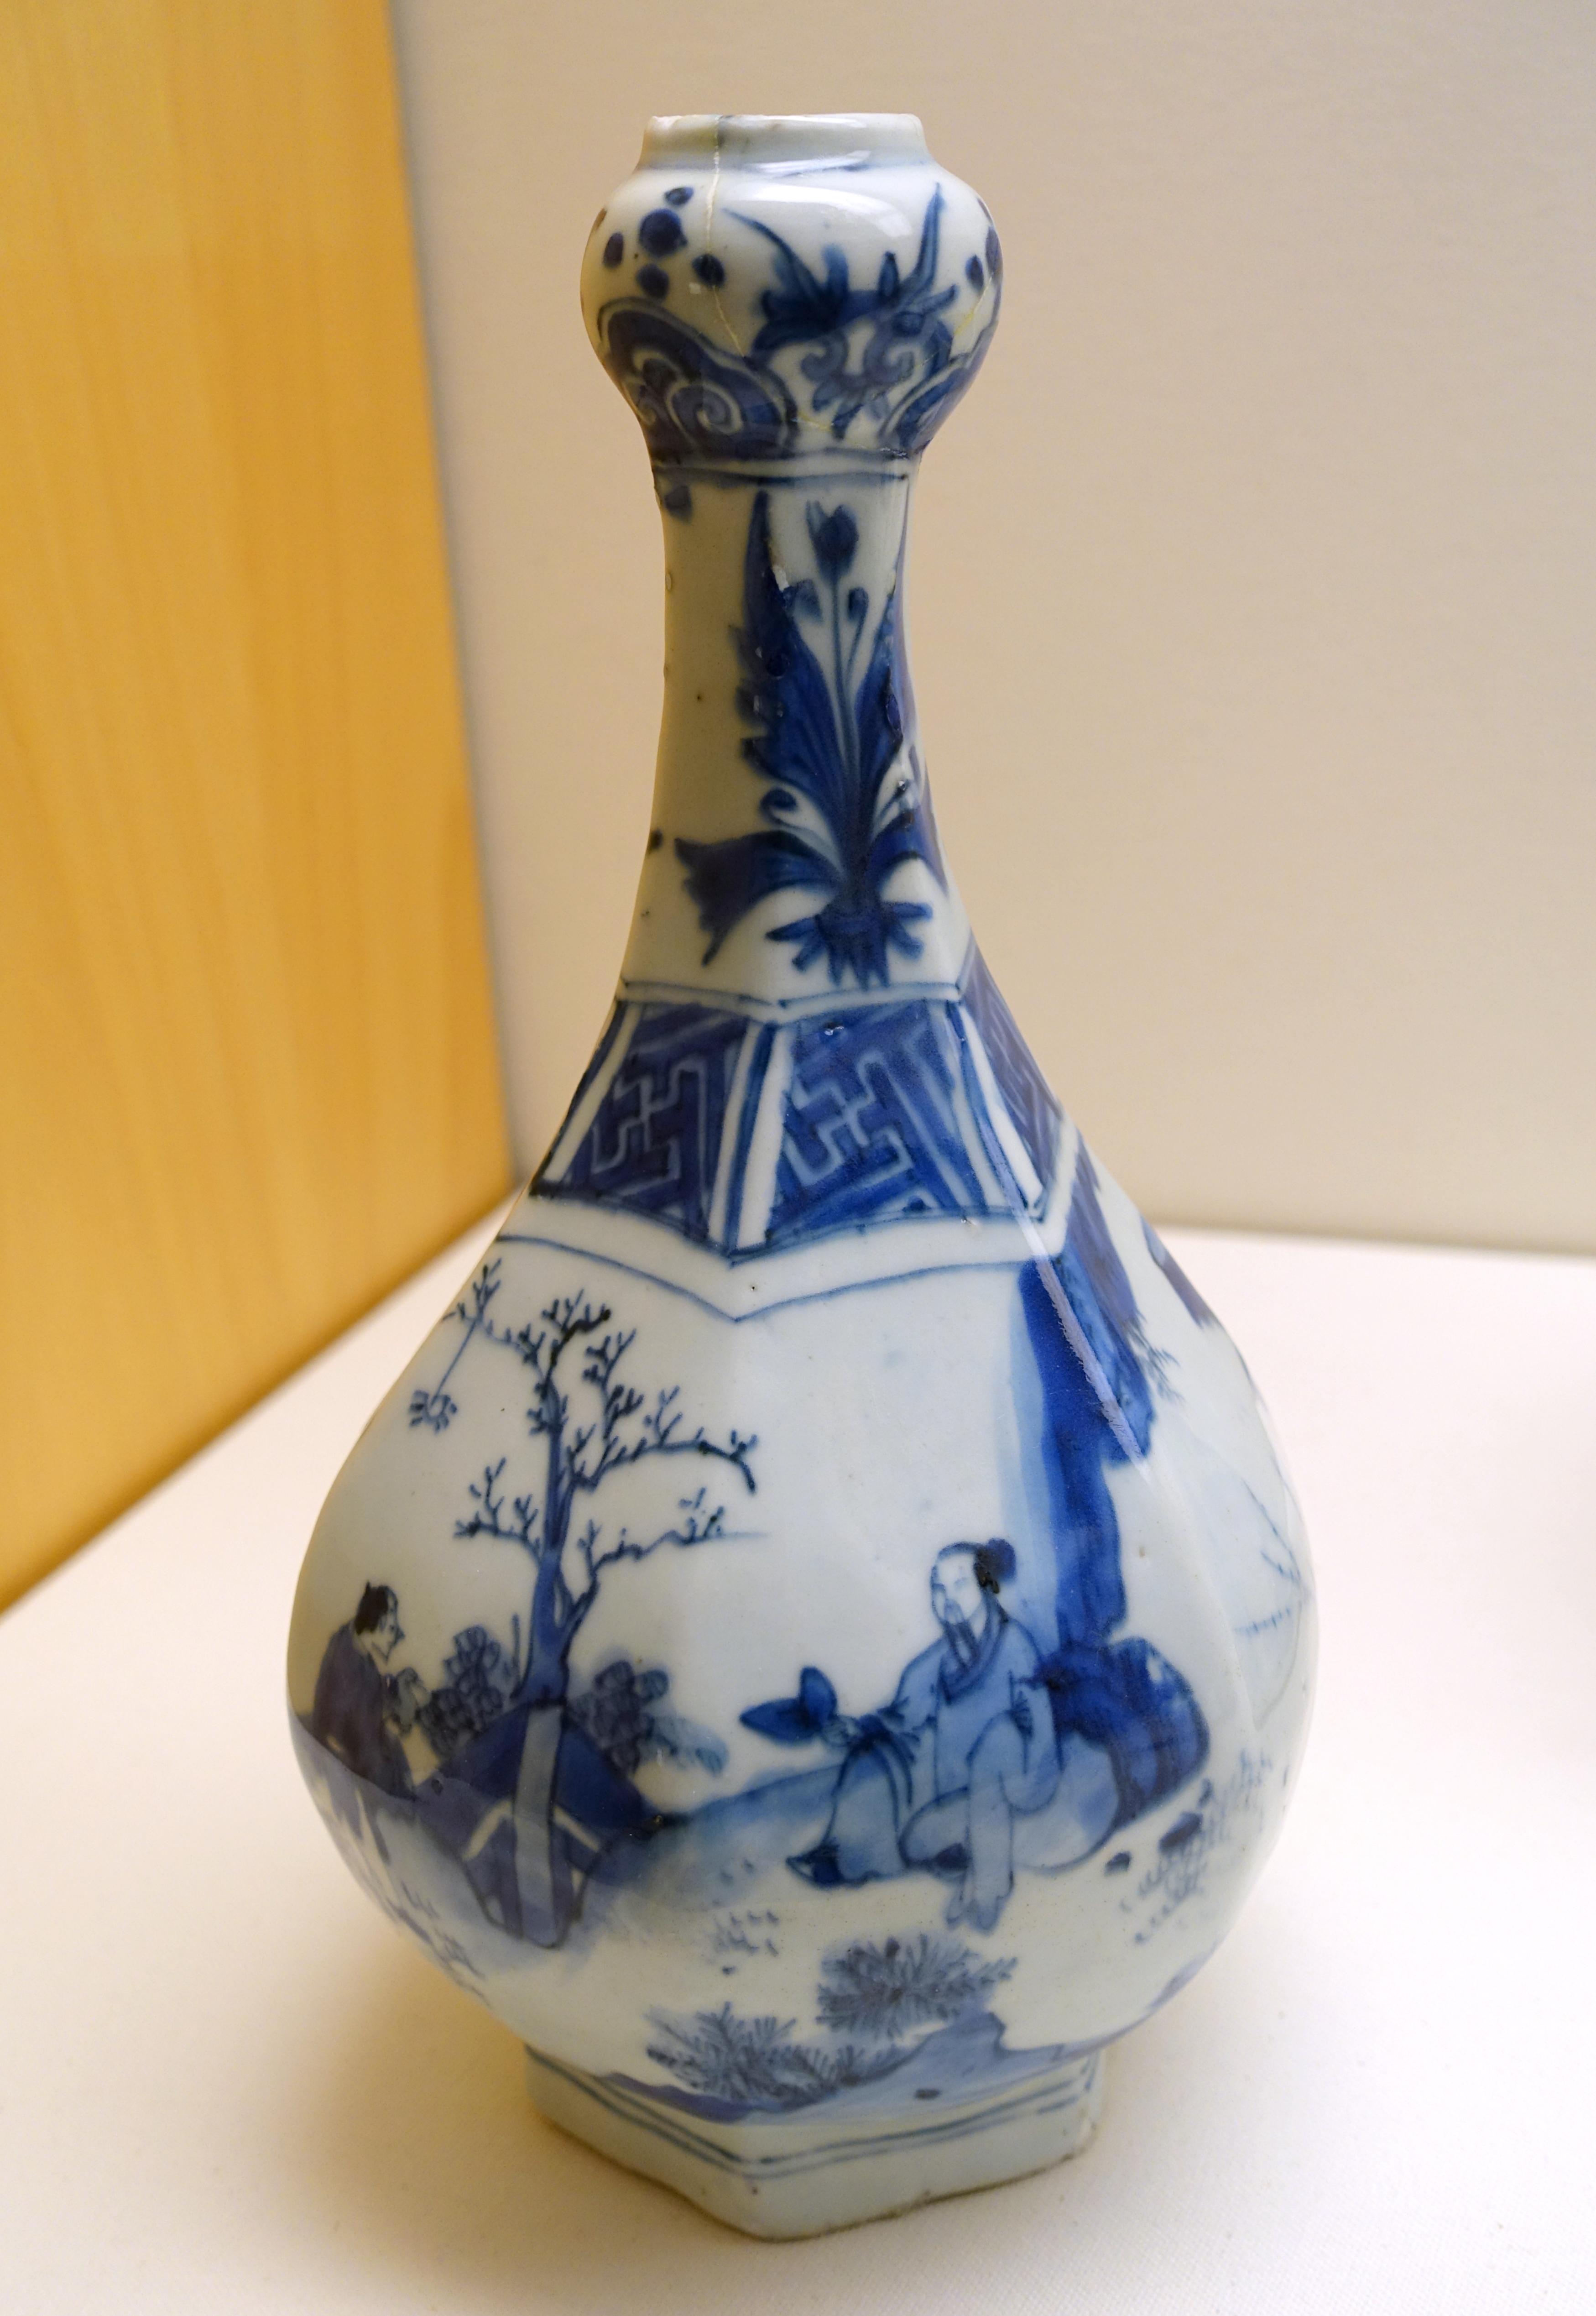 file hexagonal garlic headed vase china transitional period mid